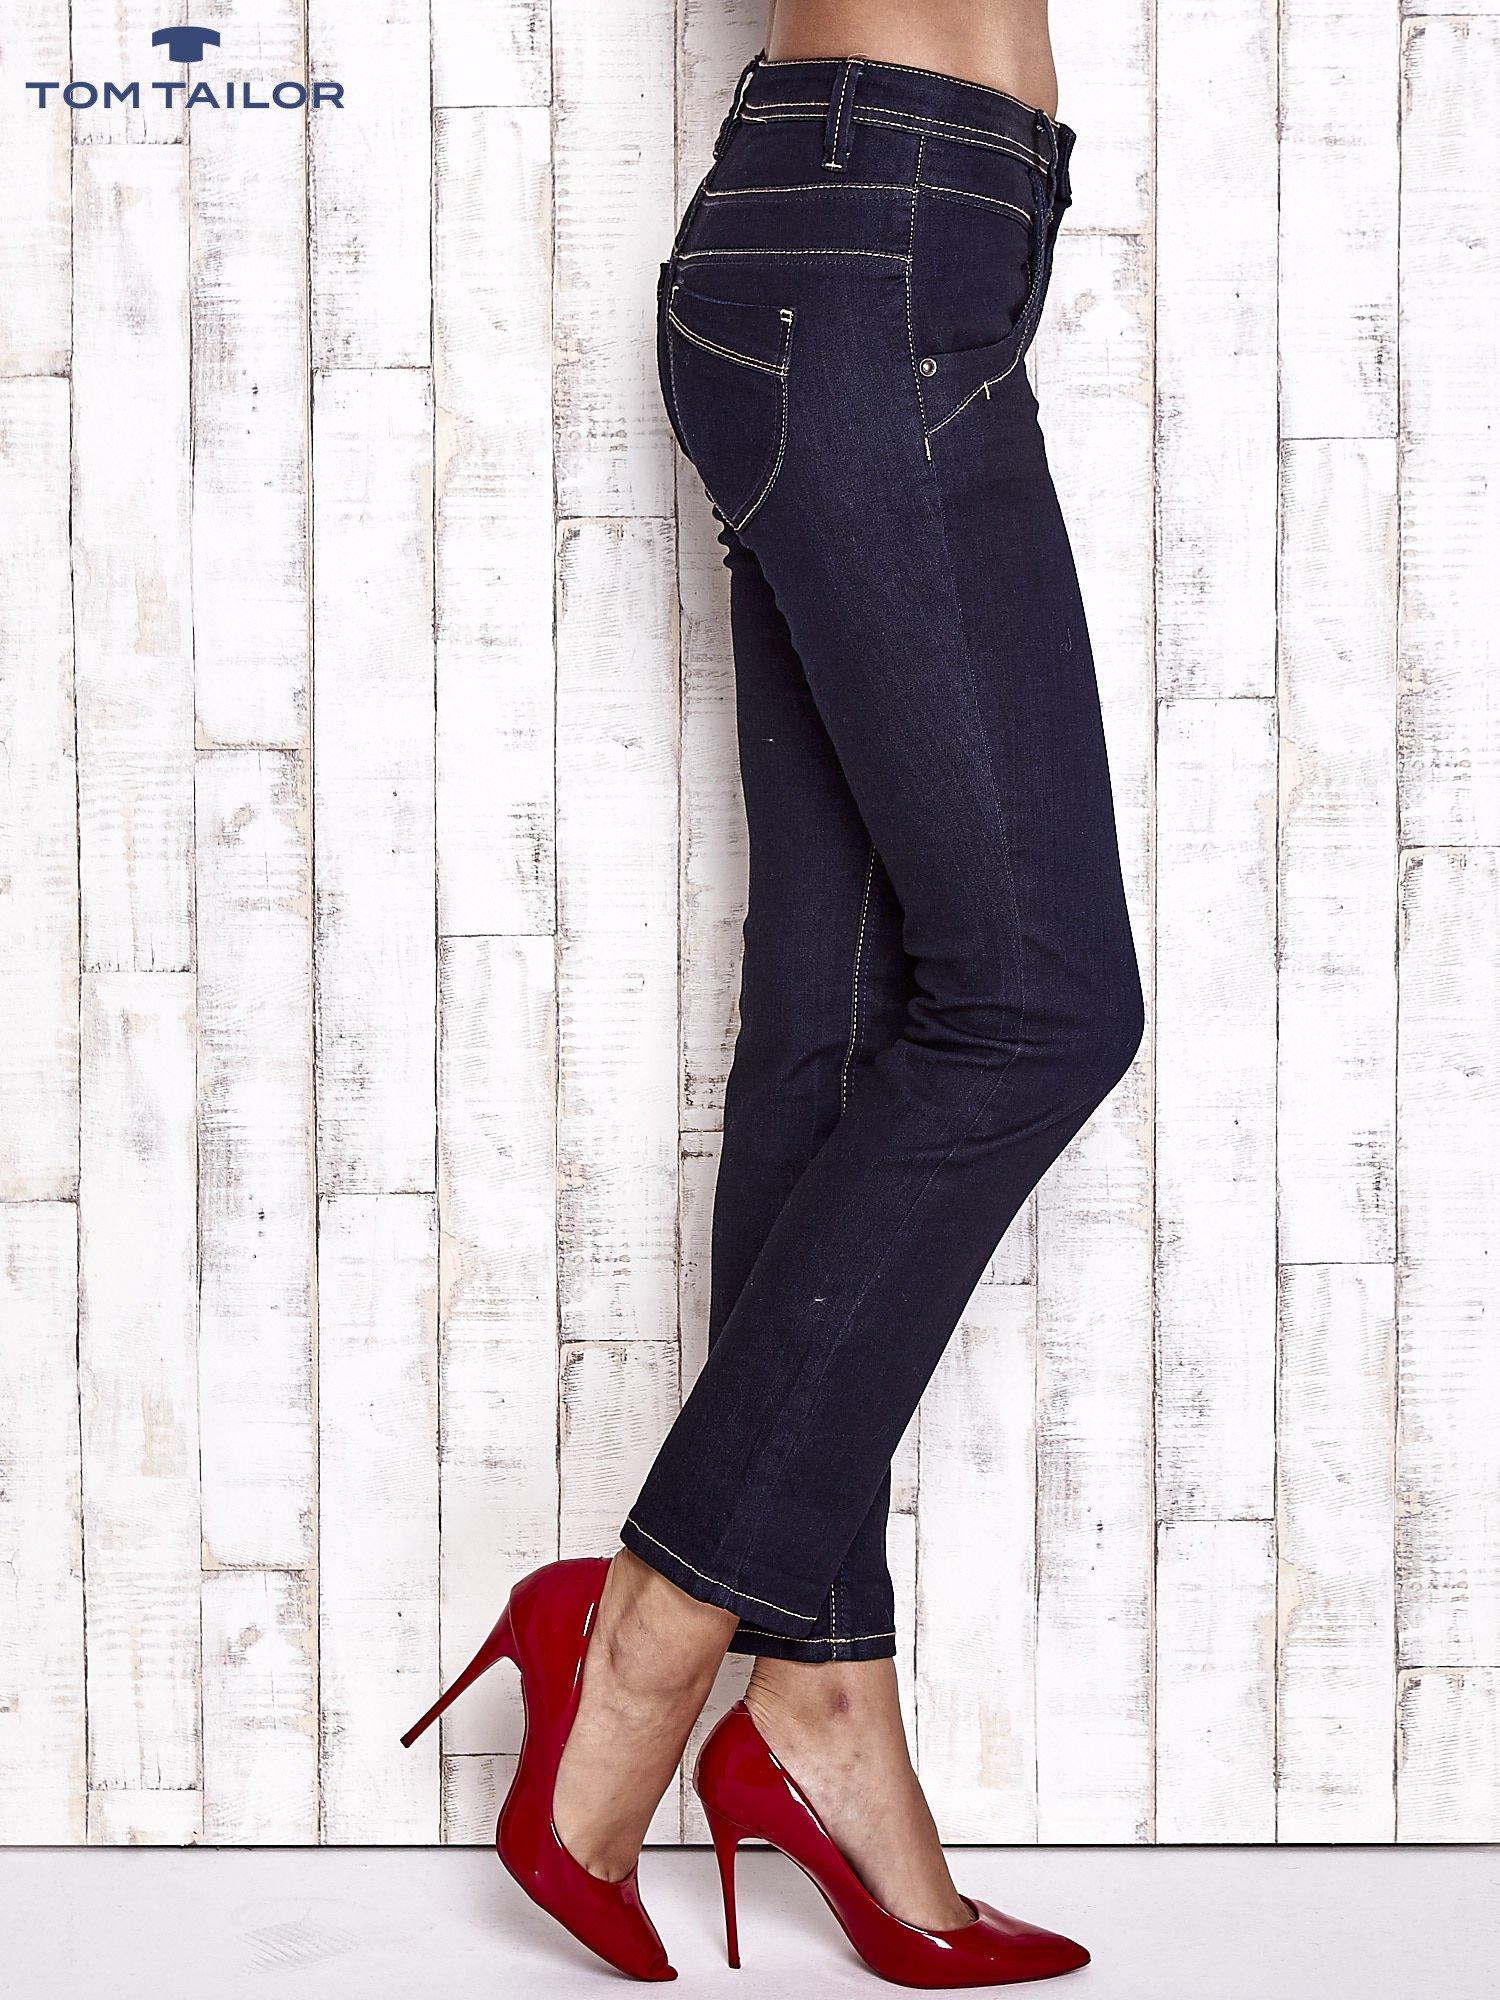 TOM TAILOR Granatowe spodnie regular jeans                                  zdj.                                  3